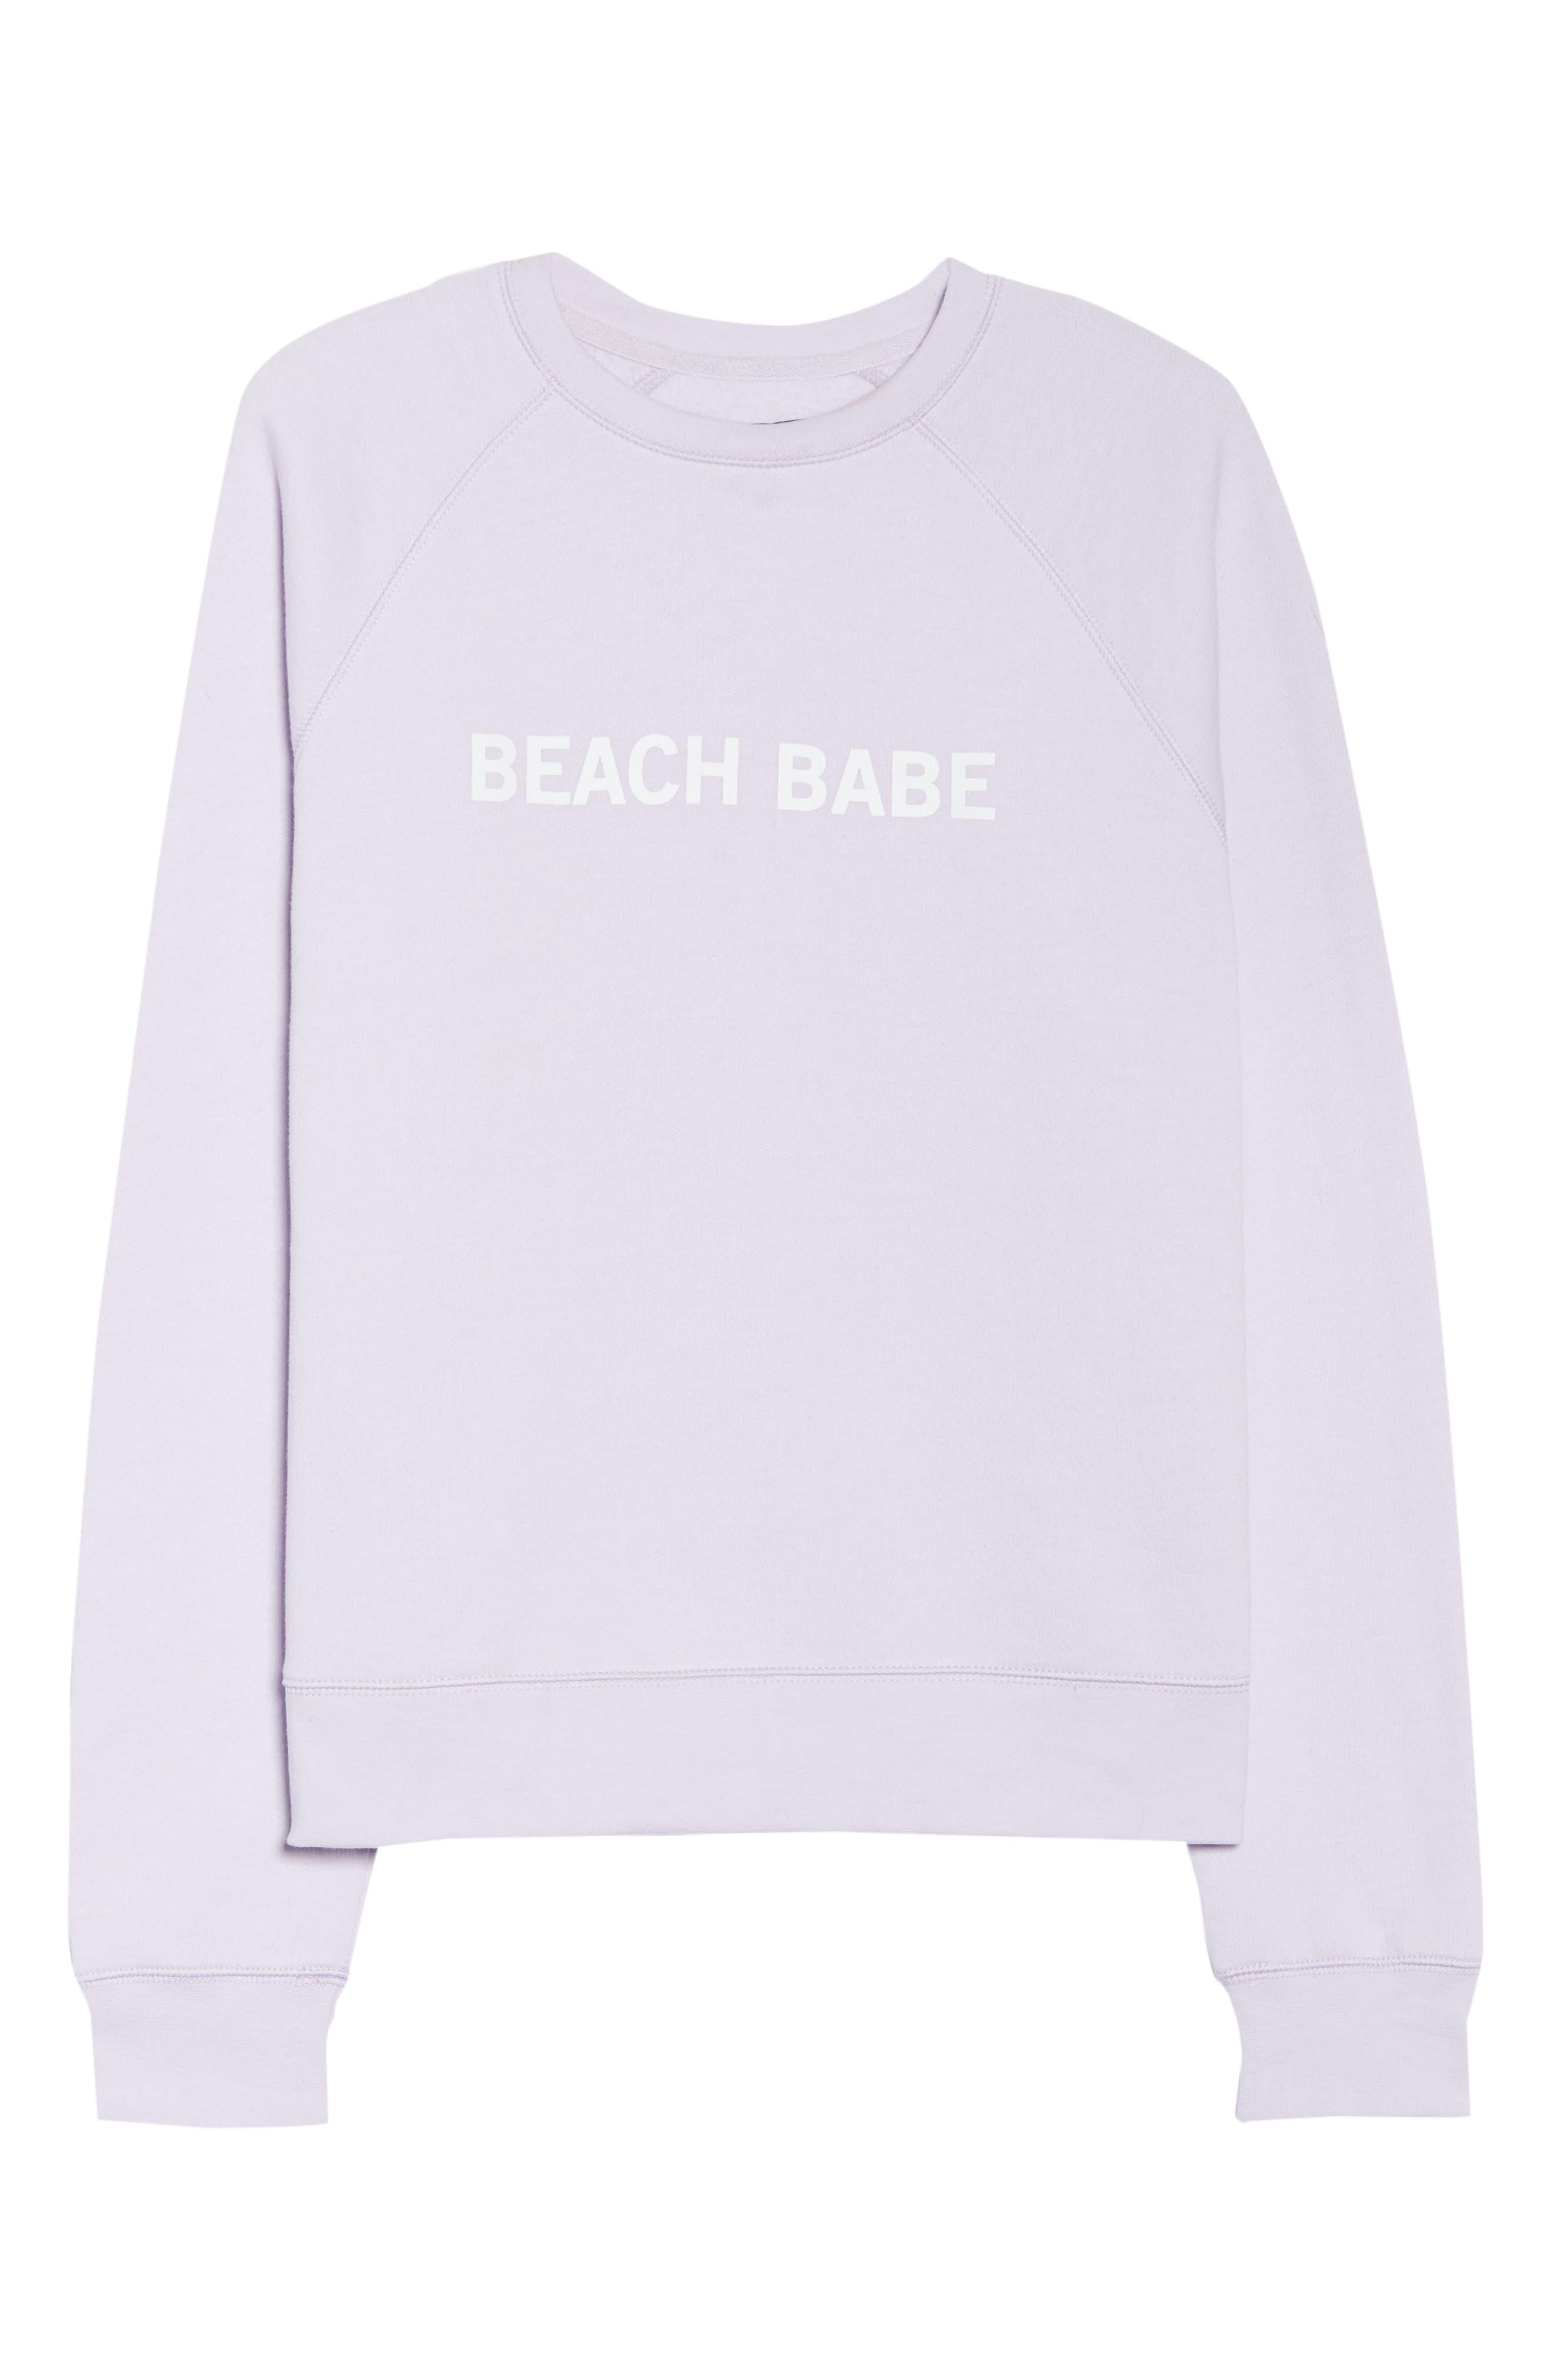 Beach Babe Middle Sister Crewneck Sweatshirt,                             Alternate thumbnail 6, color,                             Soft Lavender